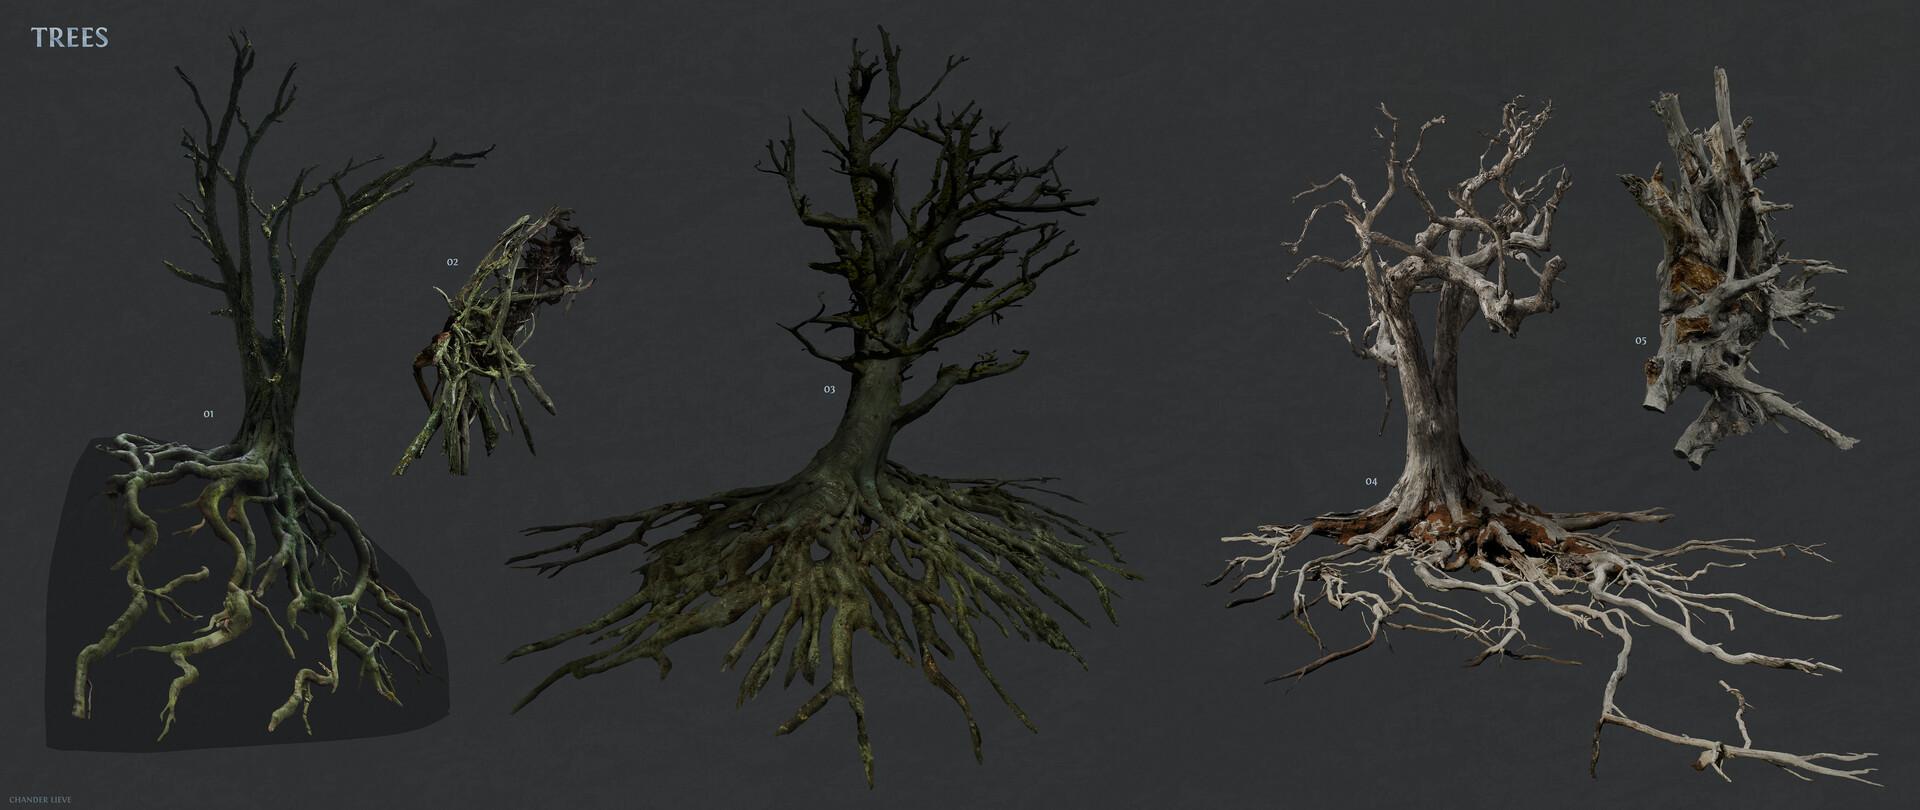 Chander lieve trees